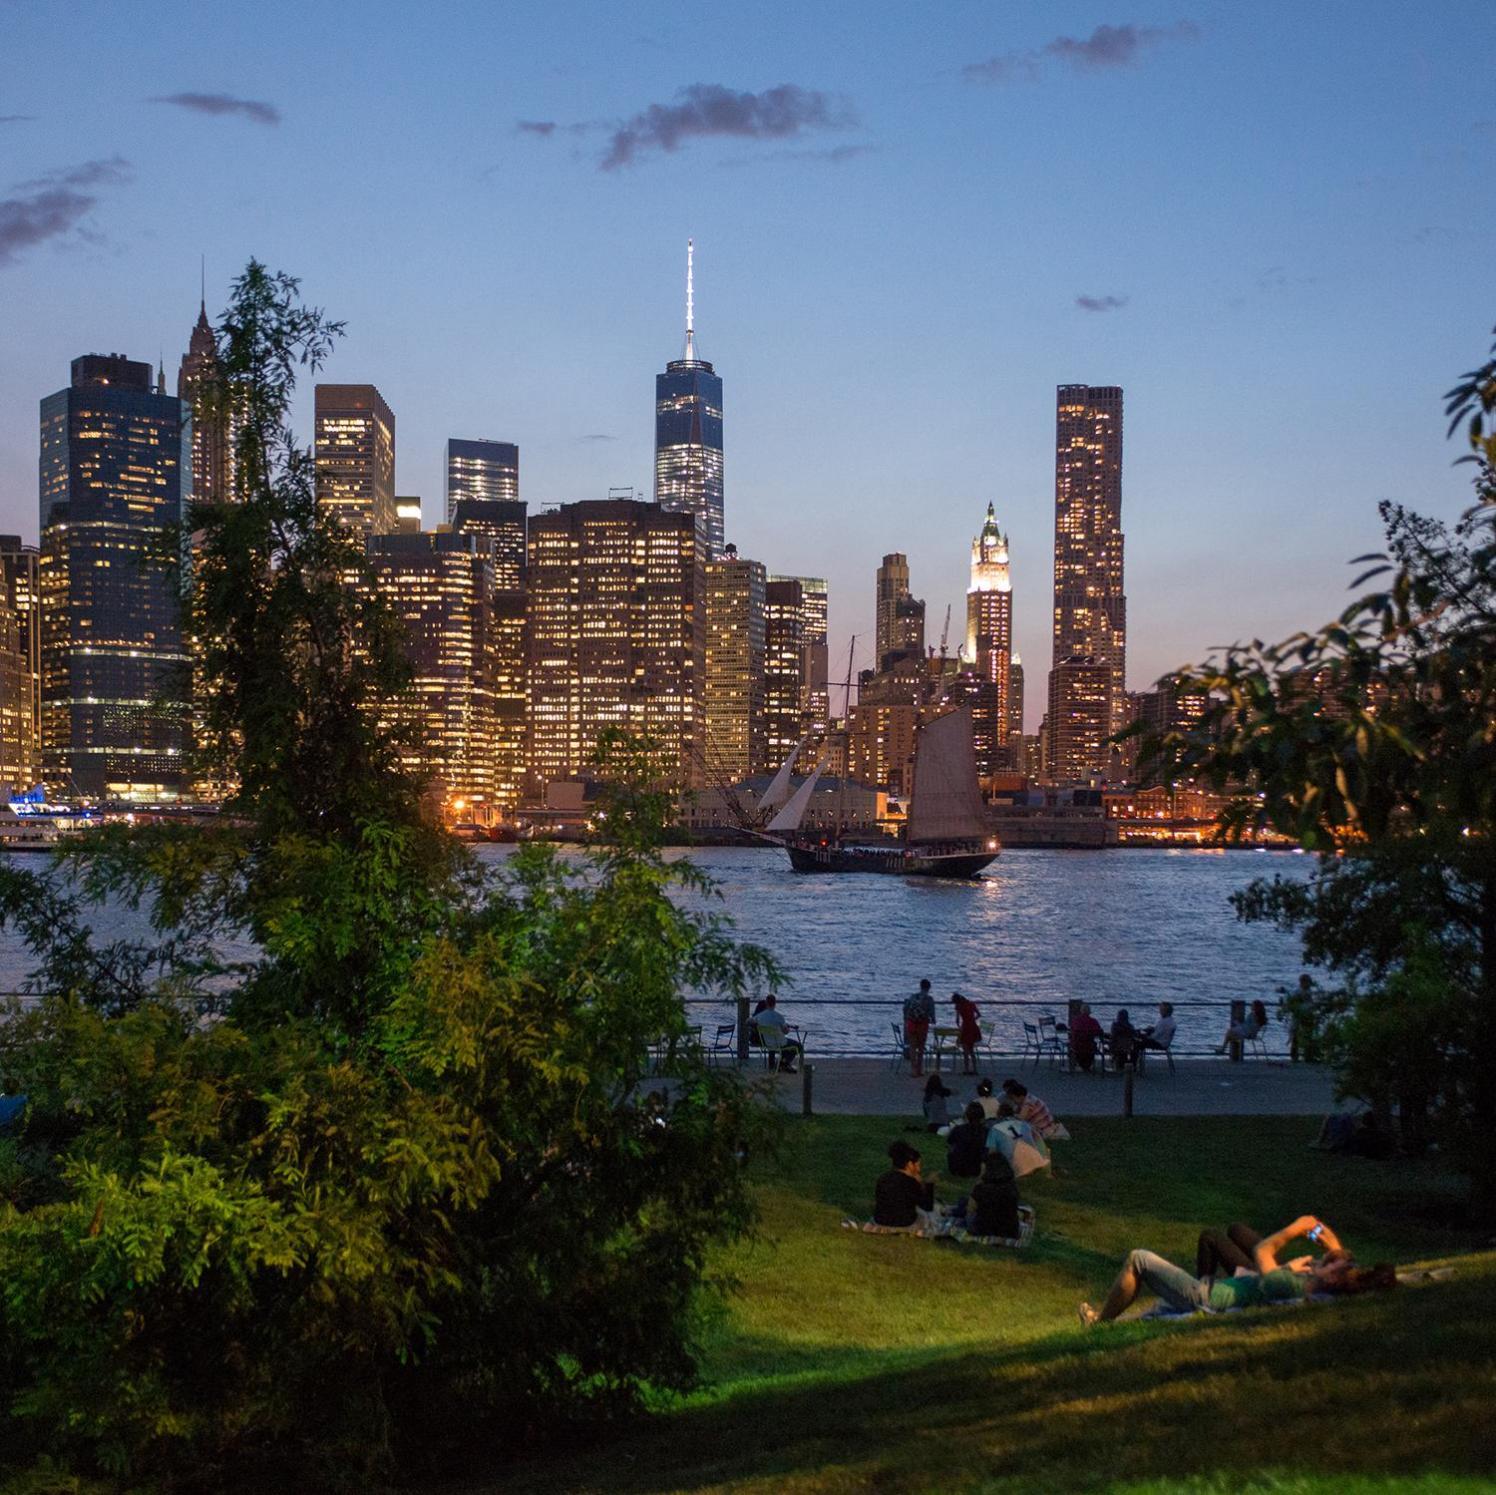 The Most Instagram-Worthy Spots at BBP - Brooklyn Bridge Park